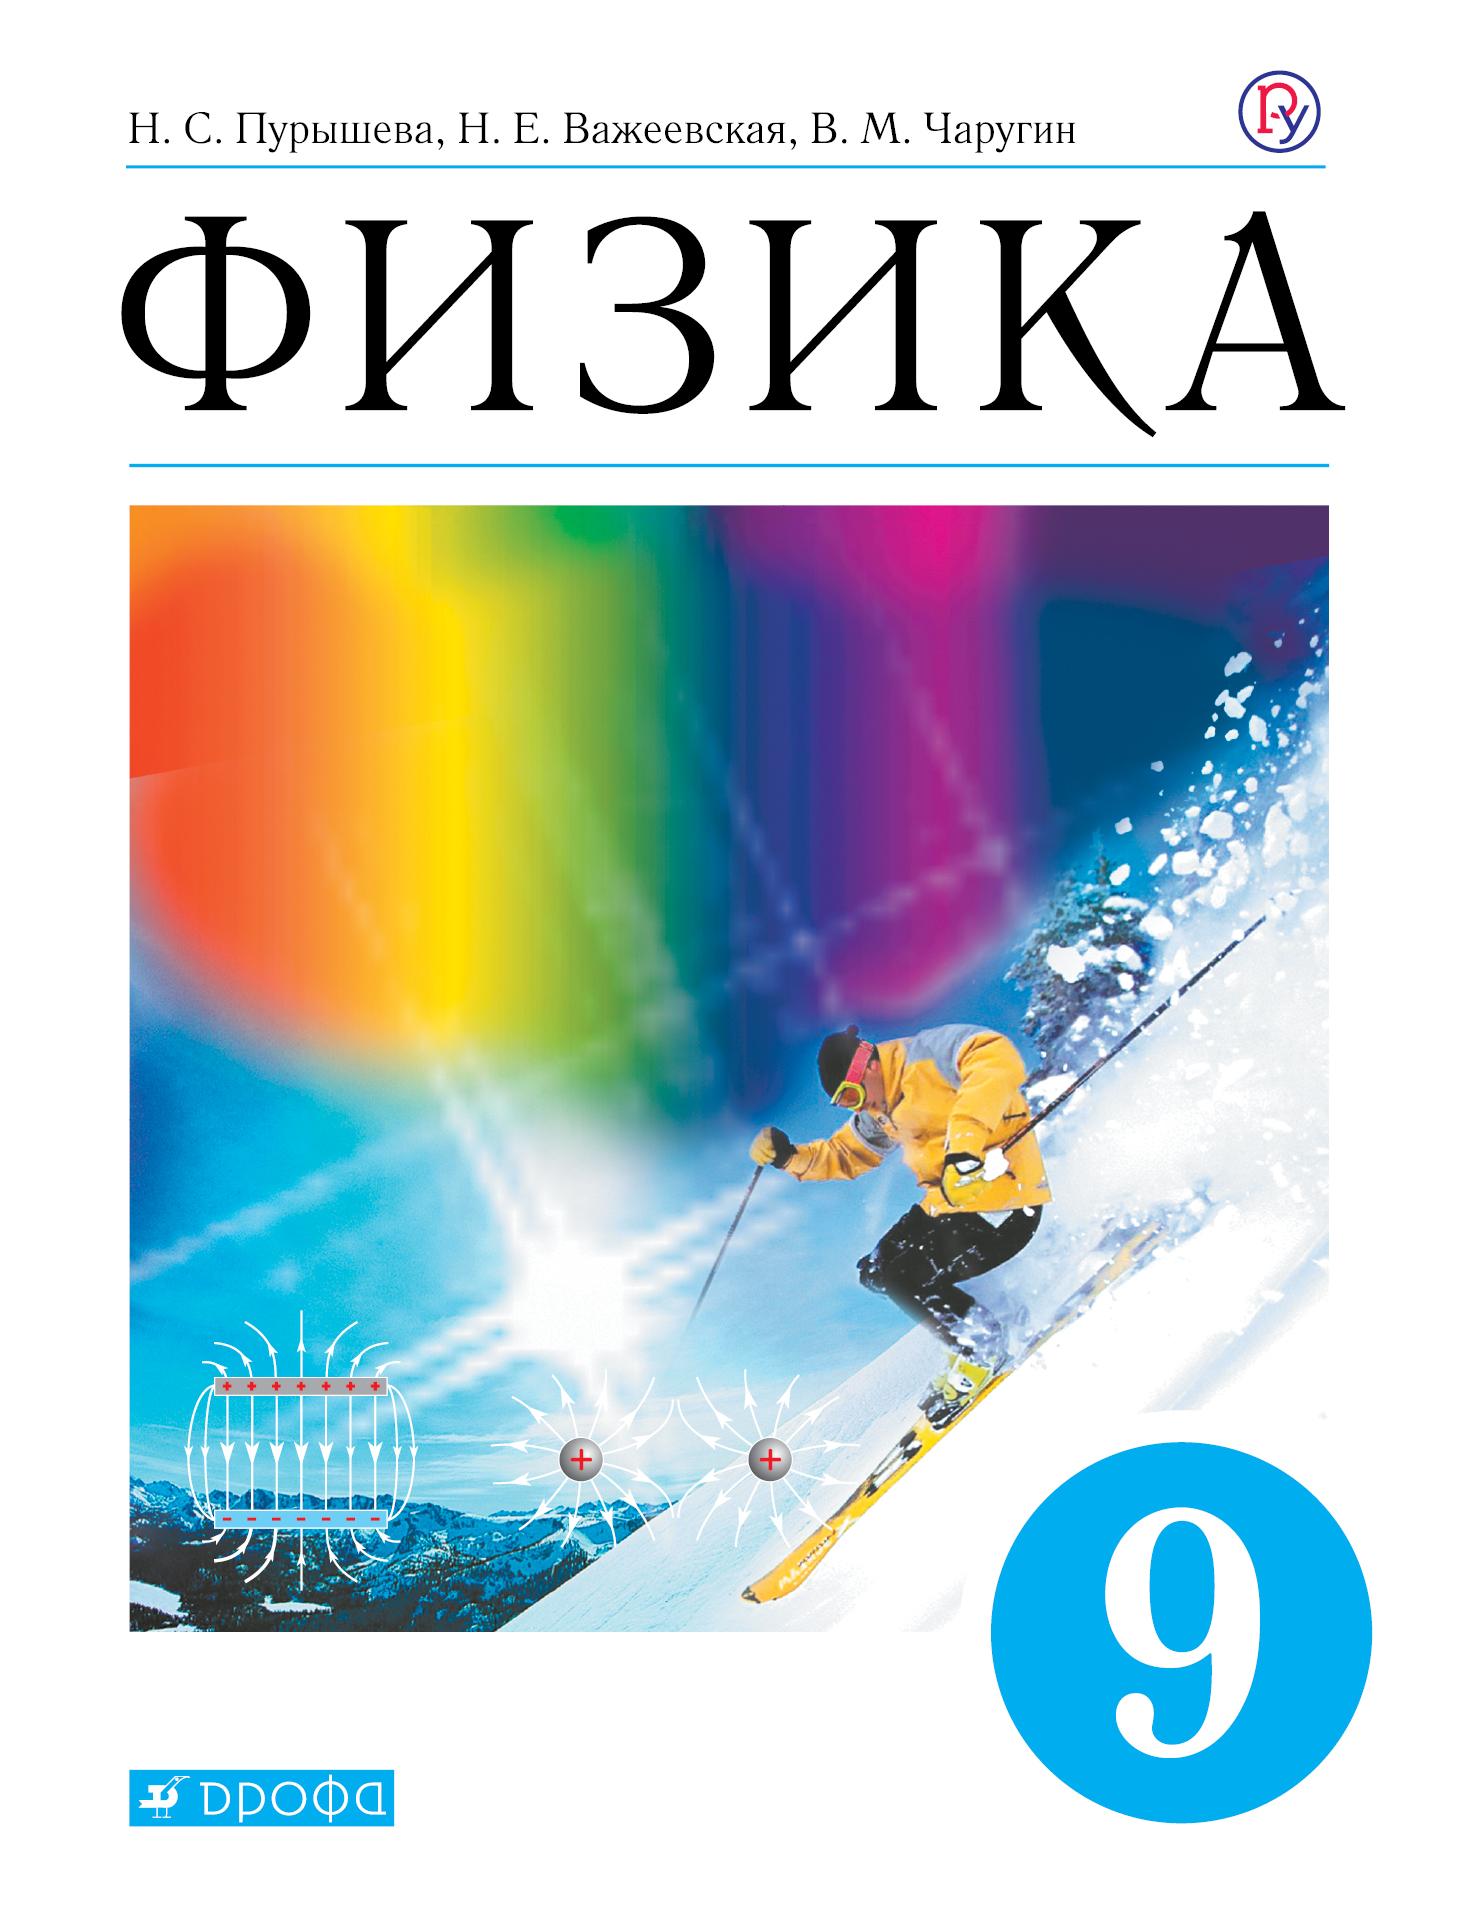 Физика. 9 класс. Учебник, Н. С. Пурышева, Н. Е. Важеевская, В. М. Чаругин